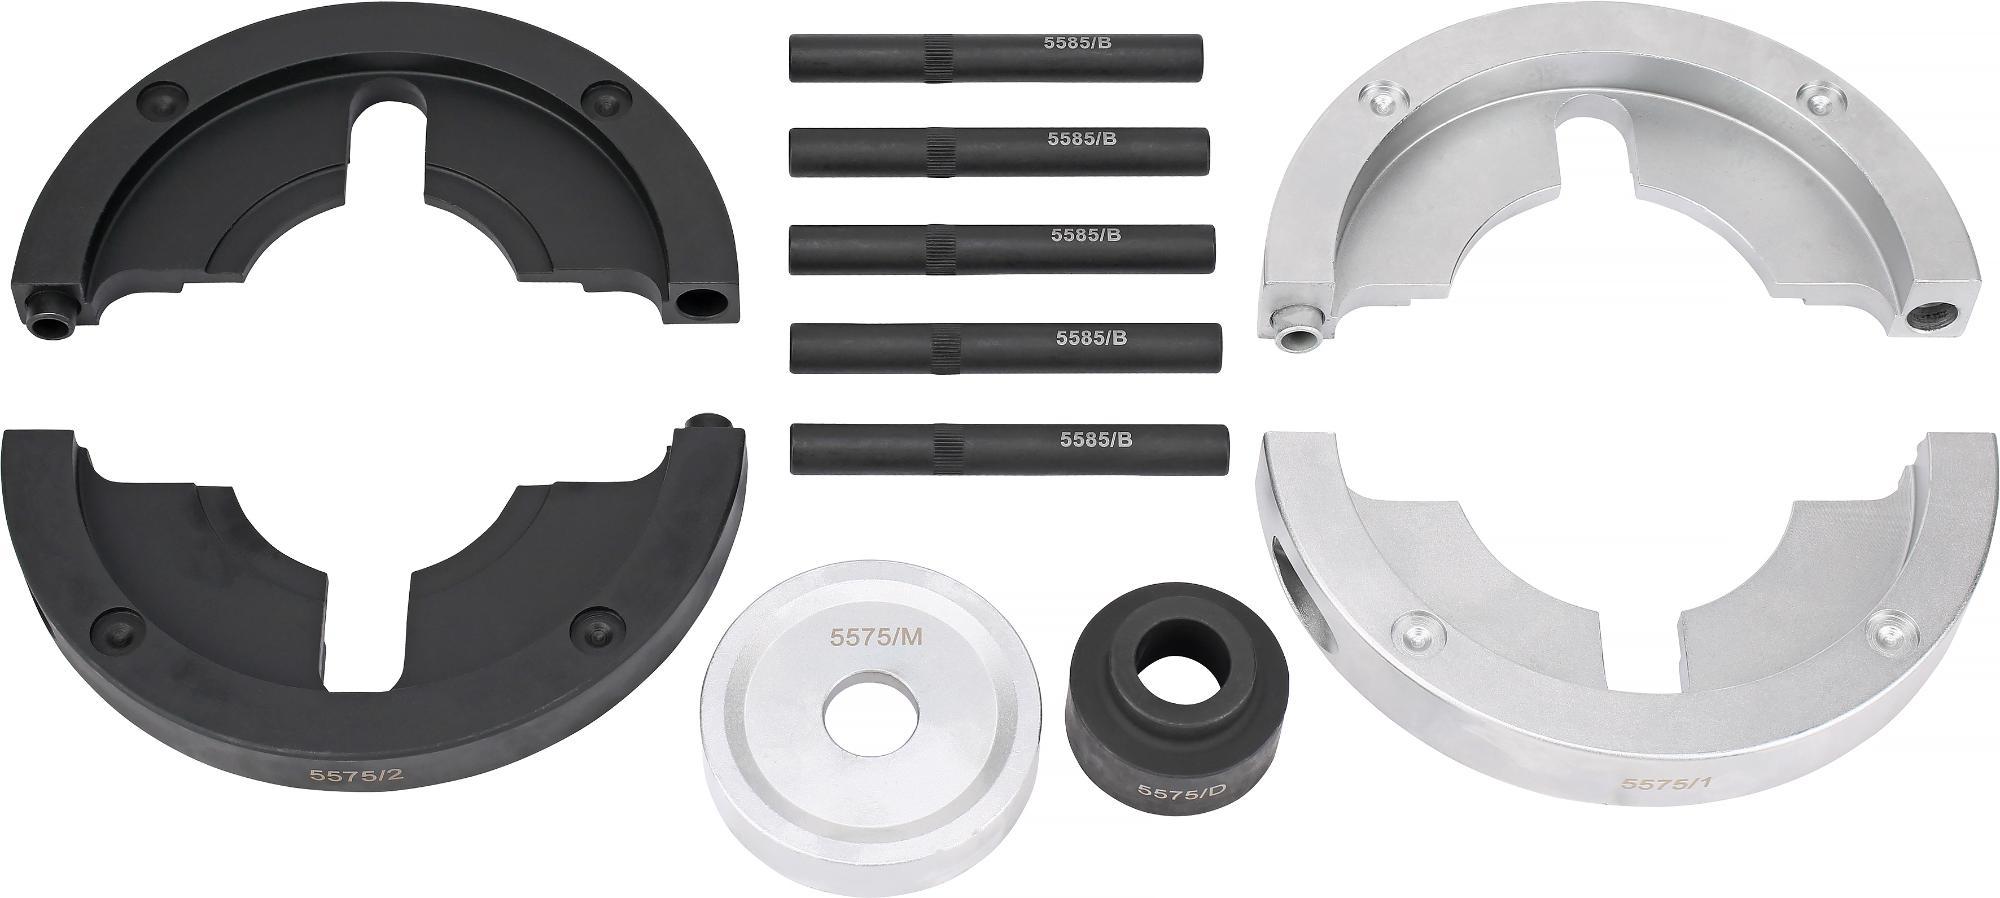 Wheel Bearing Tool Set, accessory, Smart/Mitsubishi 75 mm